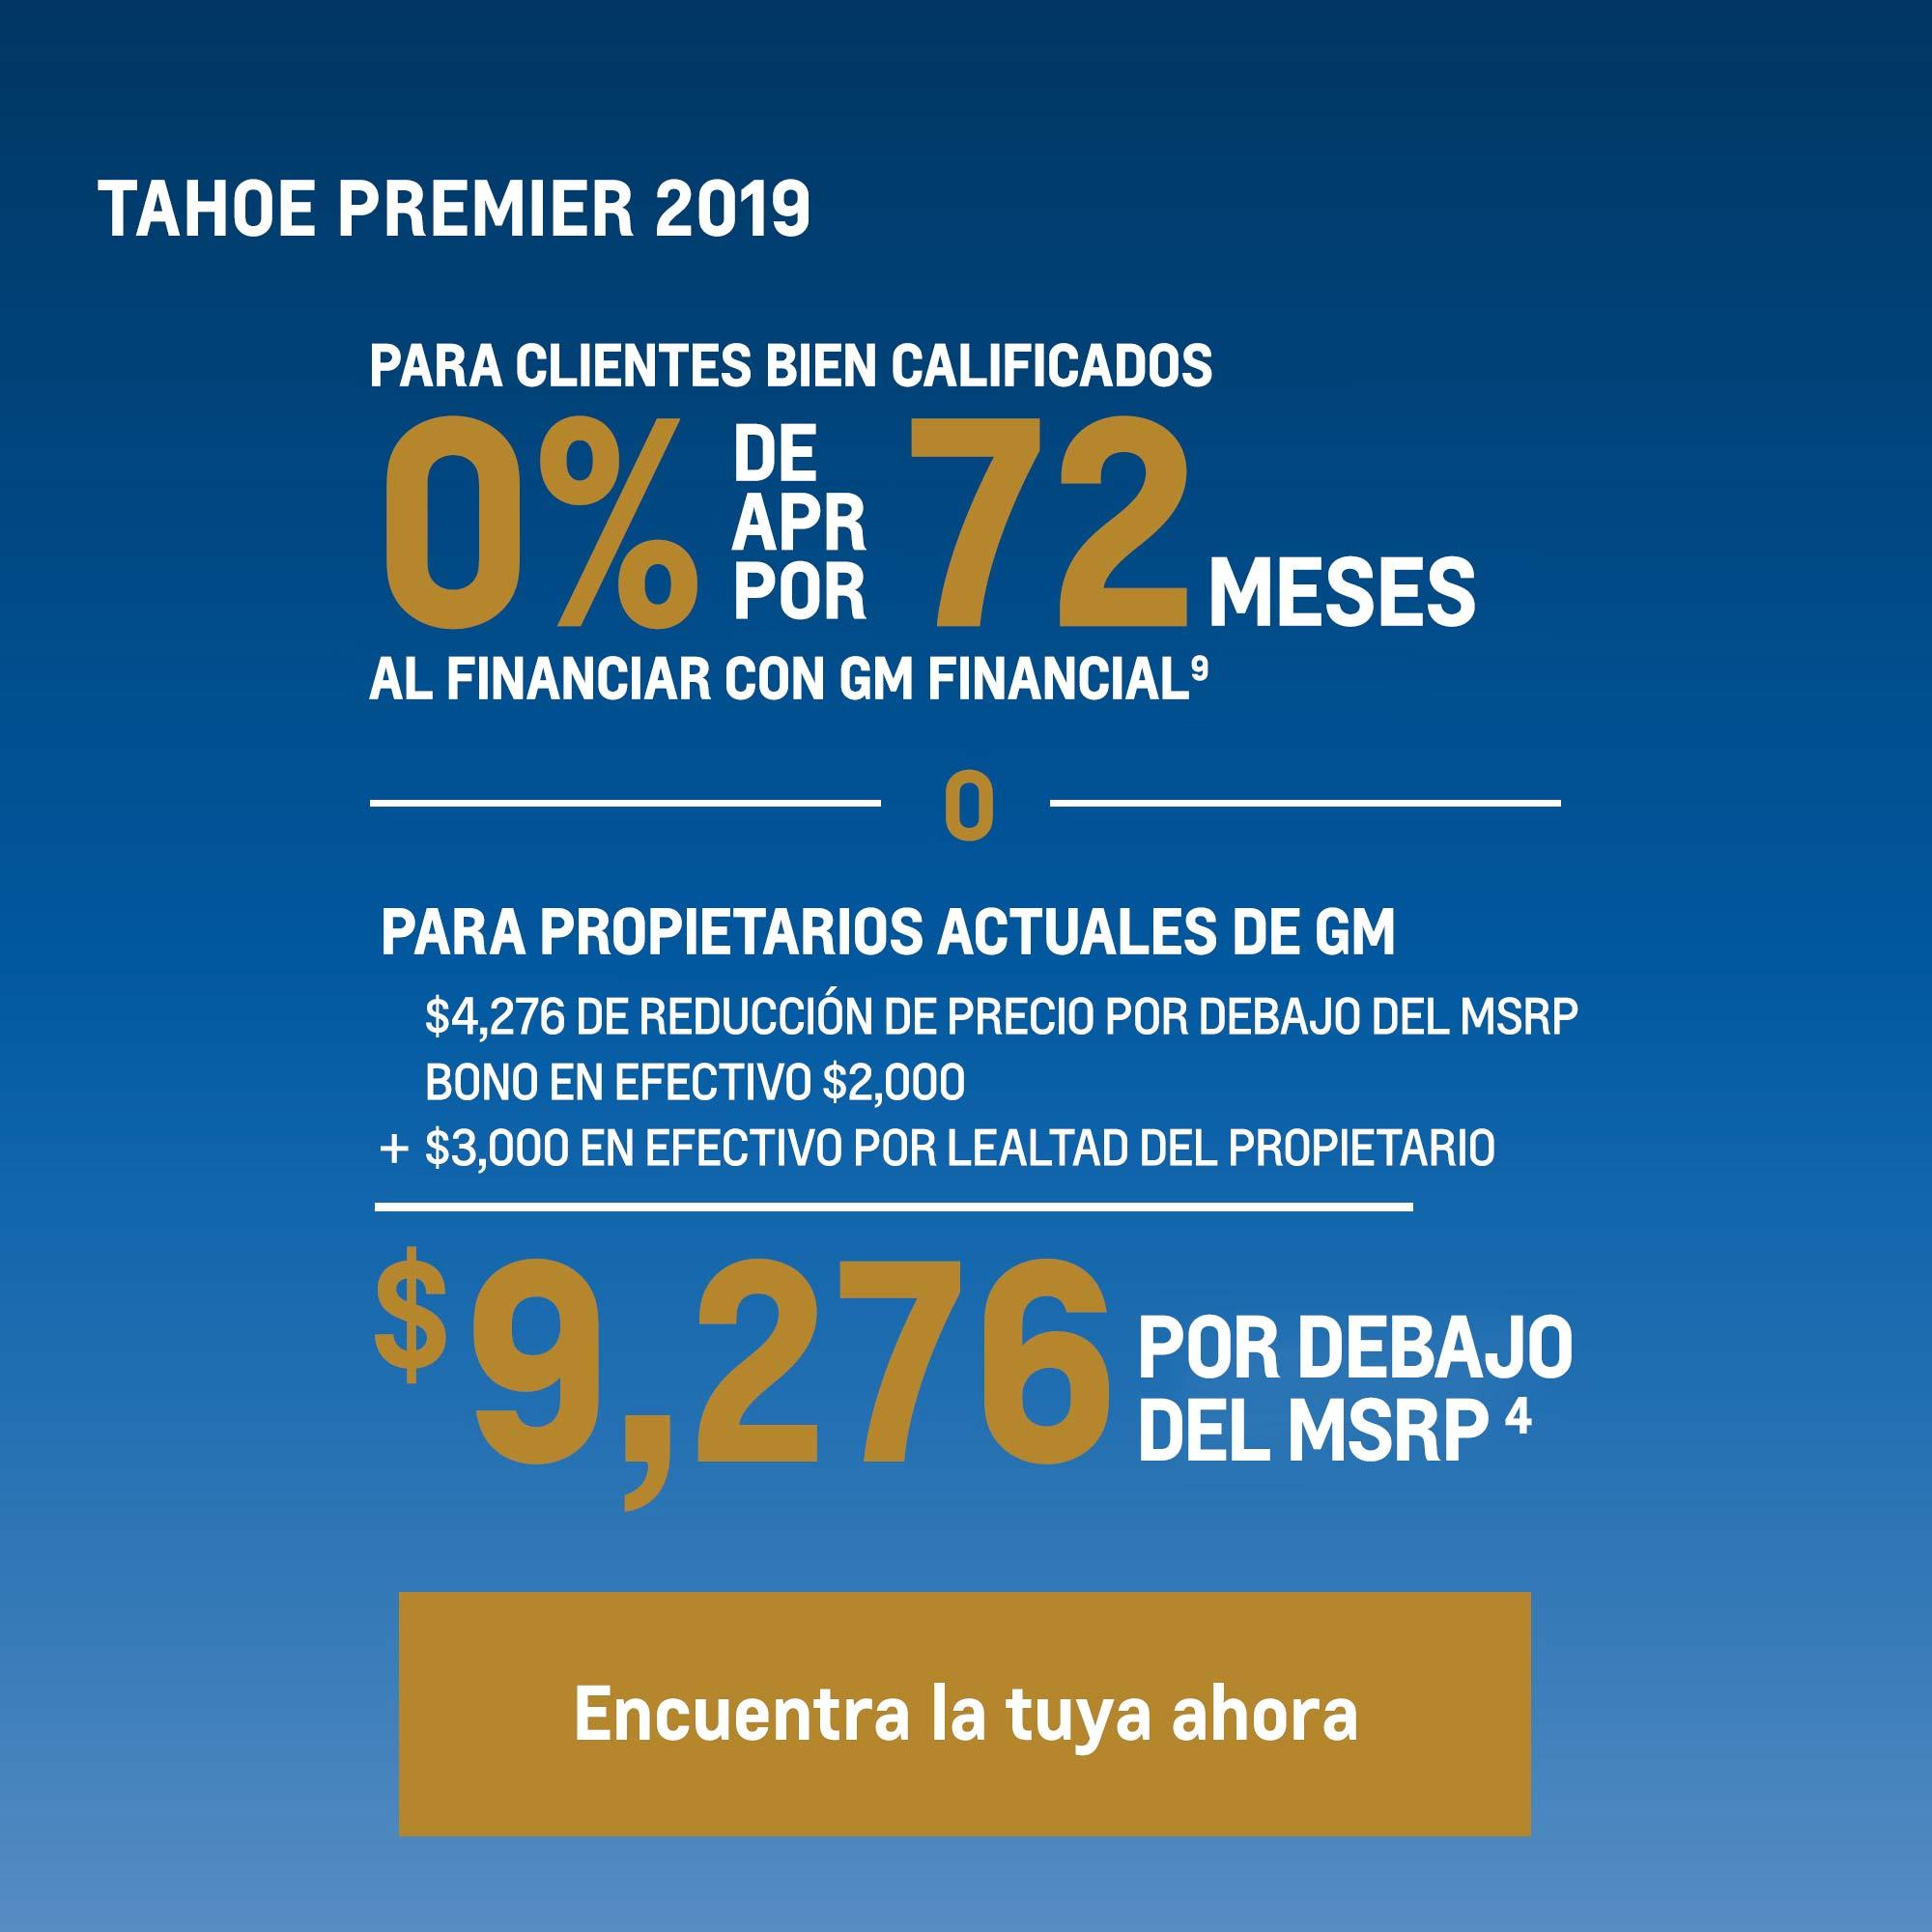 Tahoe 2019: 0% APR por 72 meses